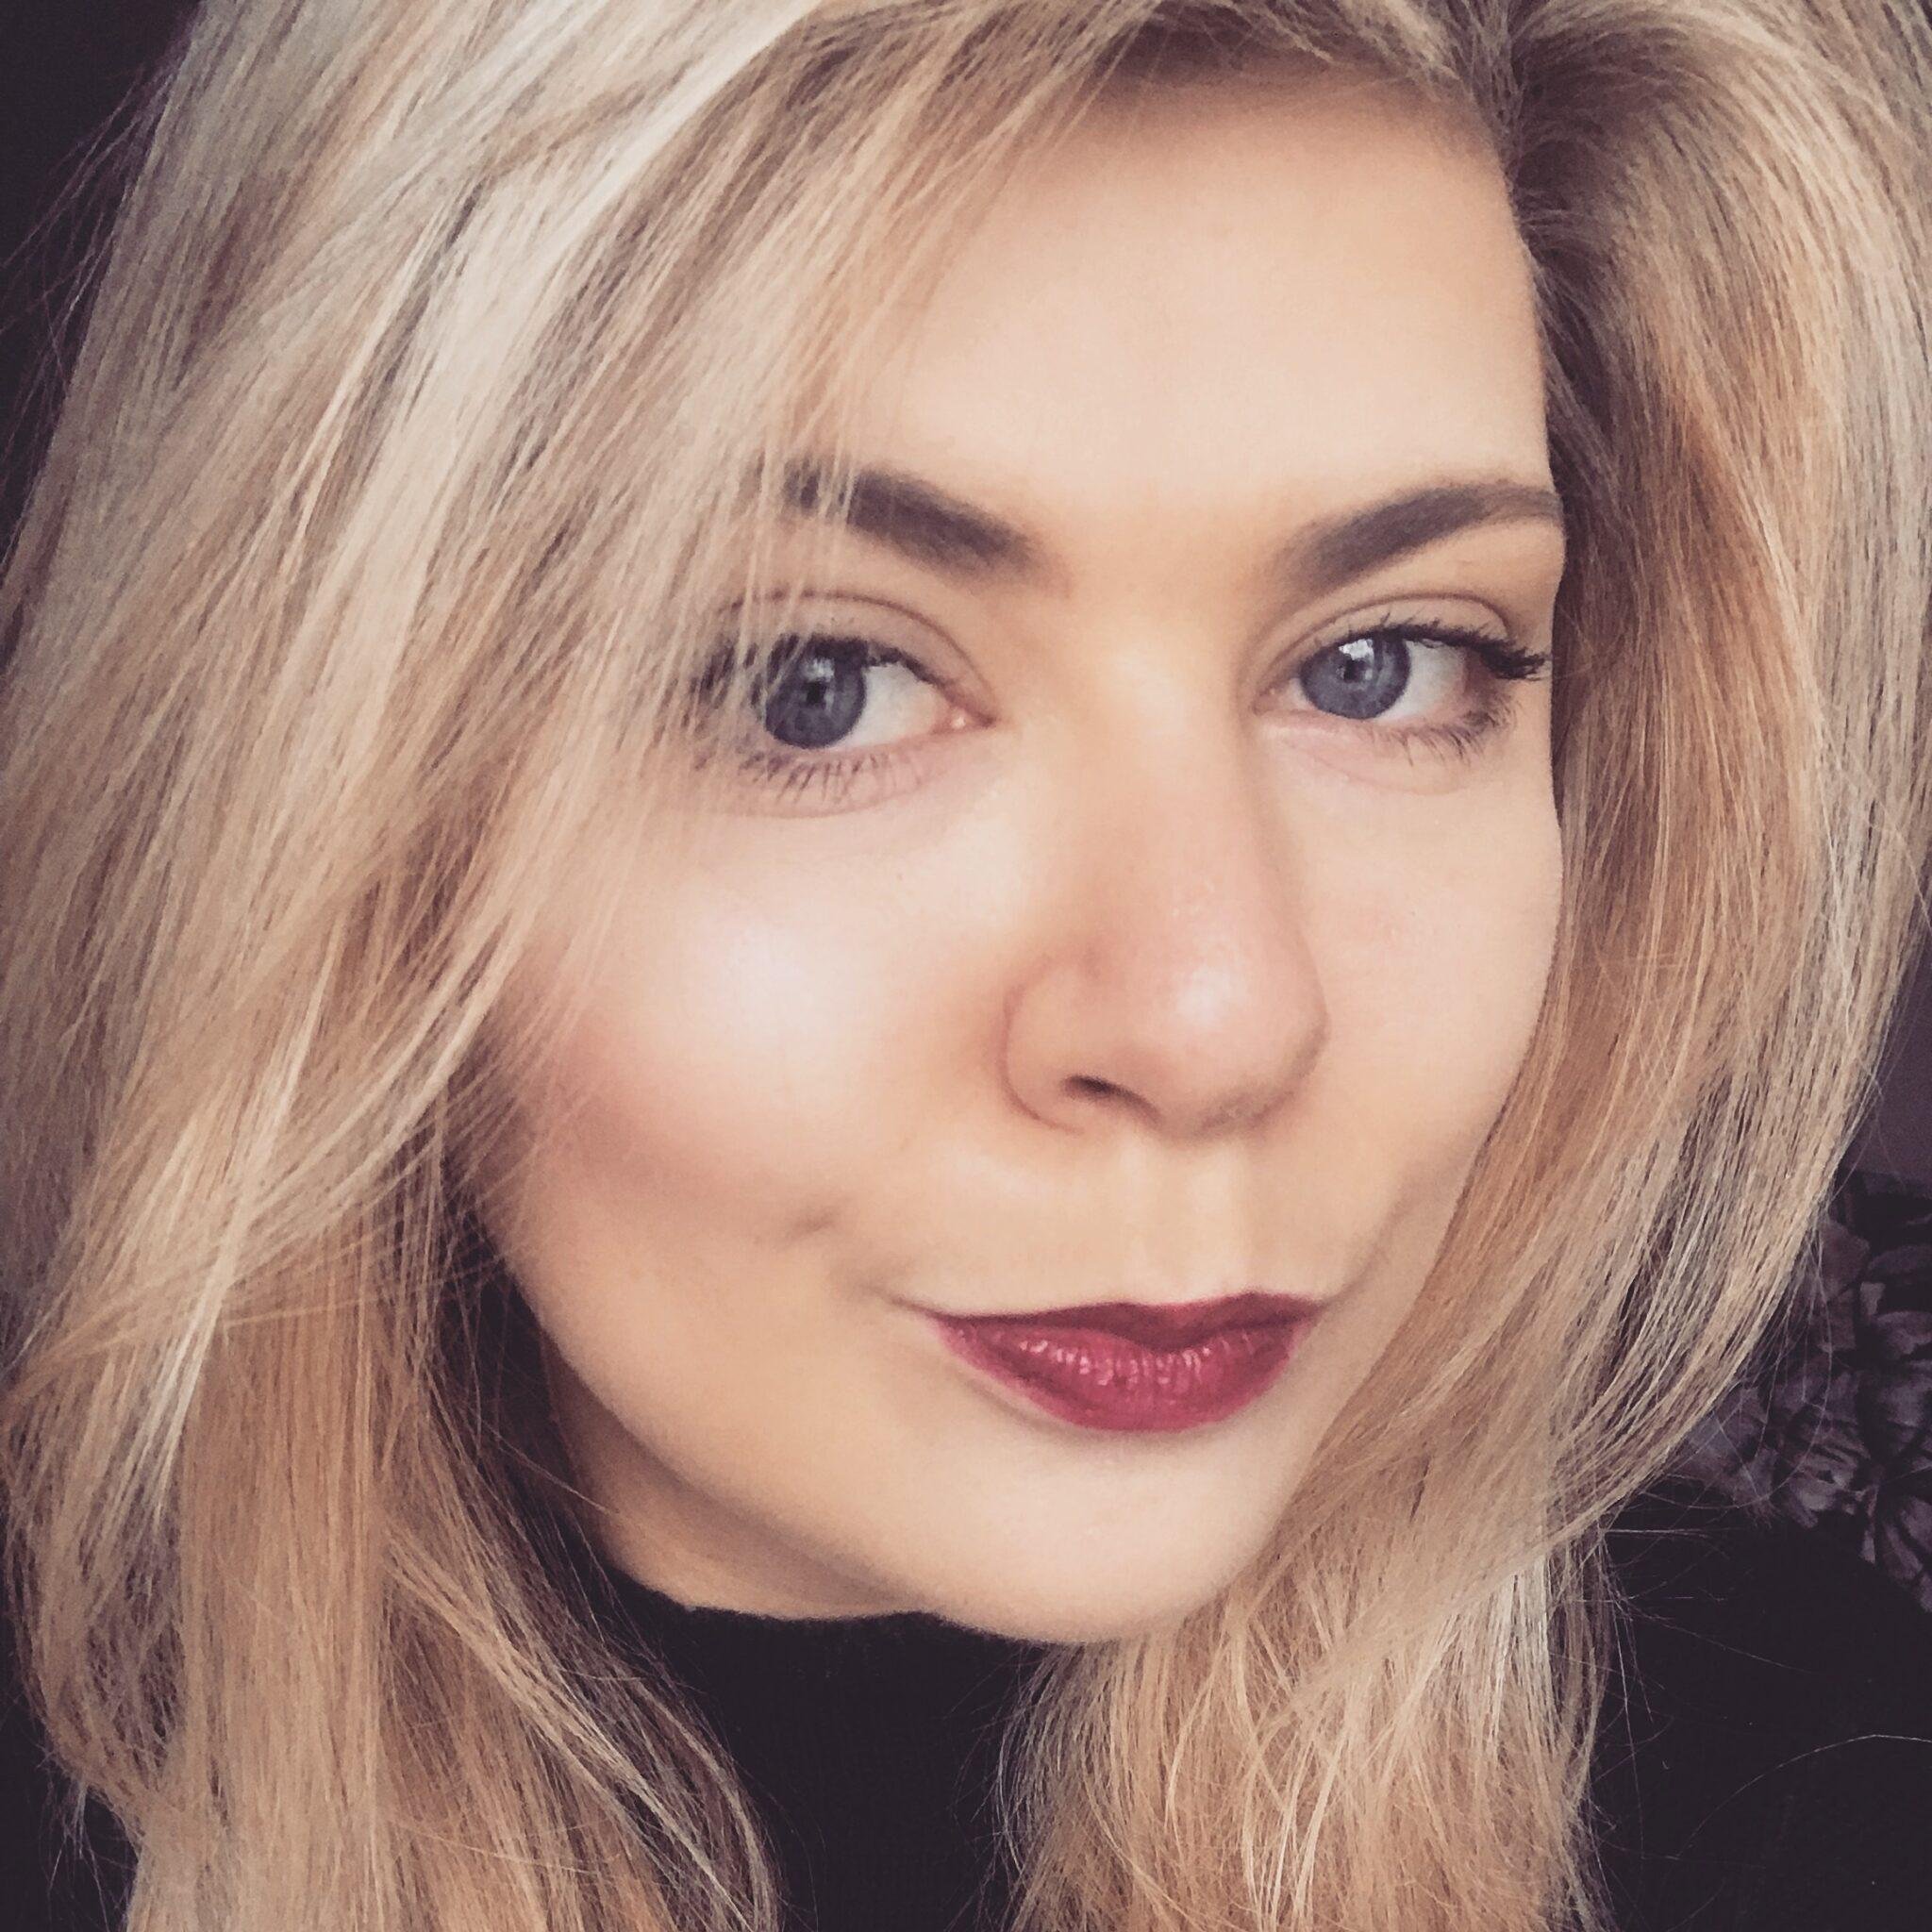 avatar for Edyta Szymanowska